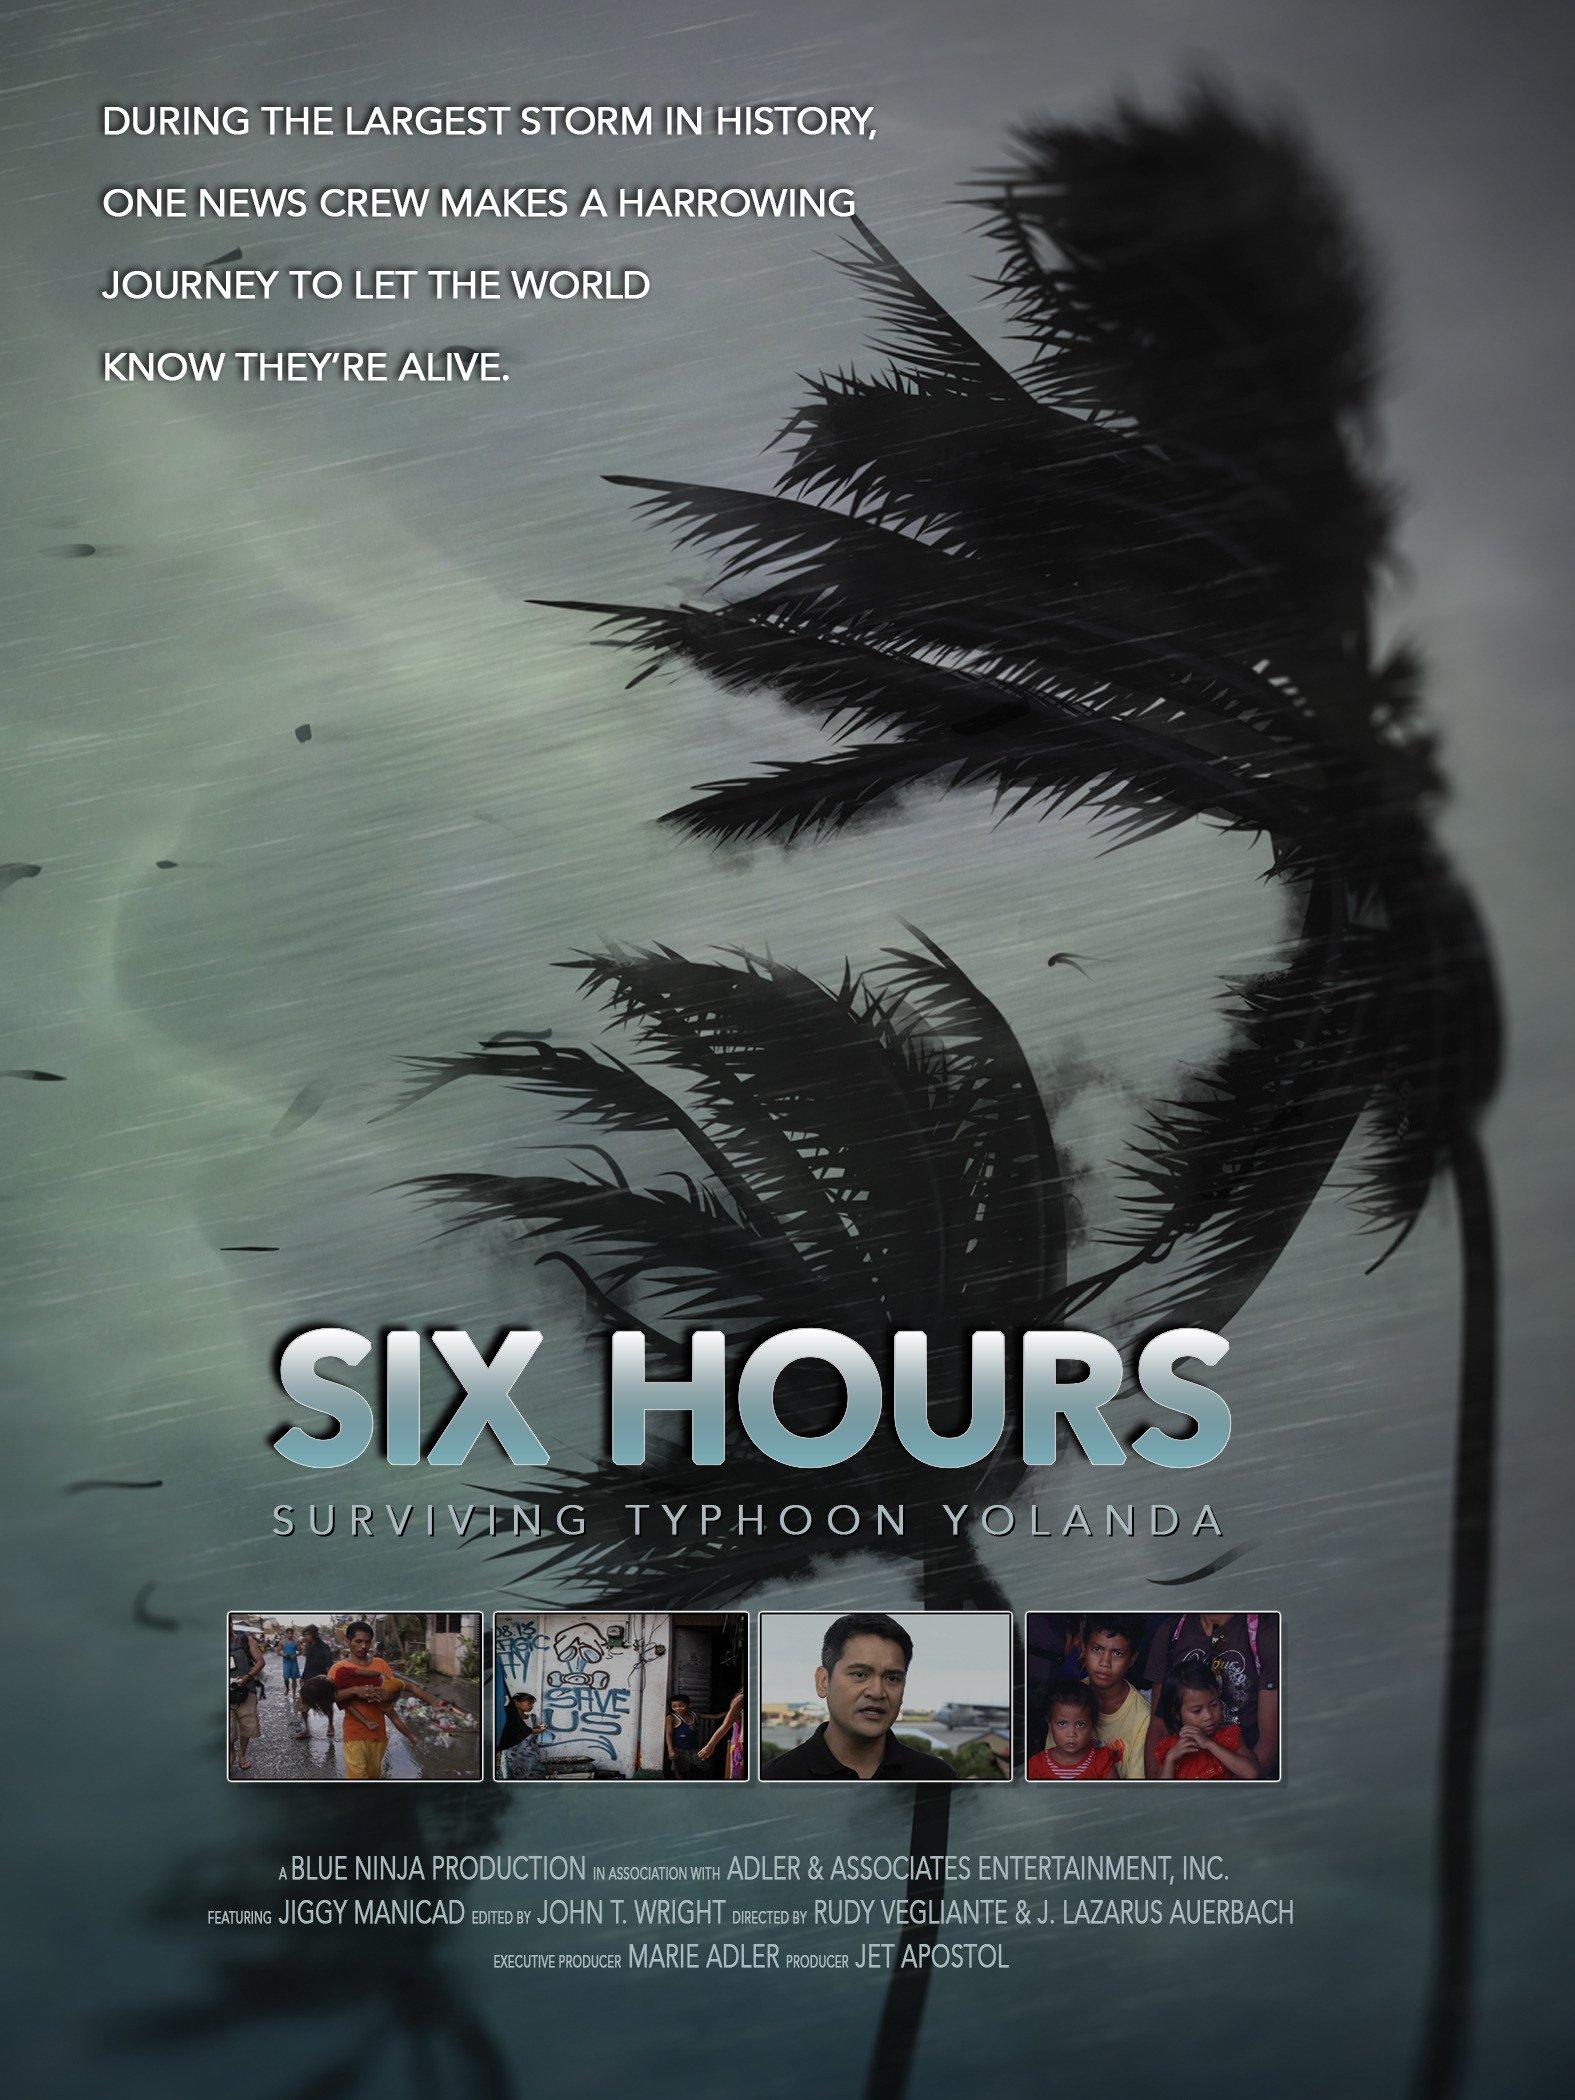 Six Hours: Surviving Typhoon Yolanda